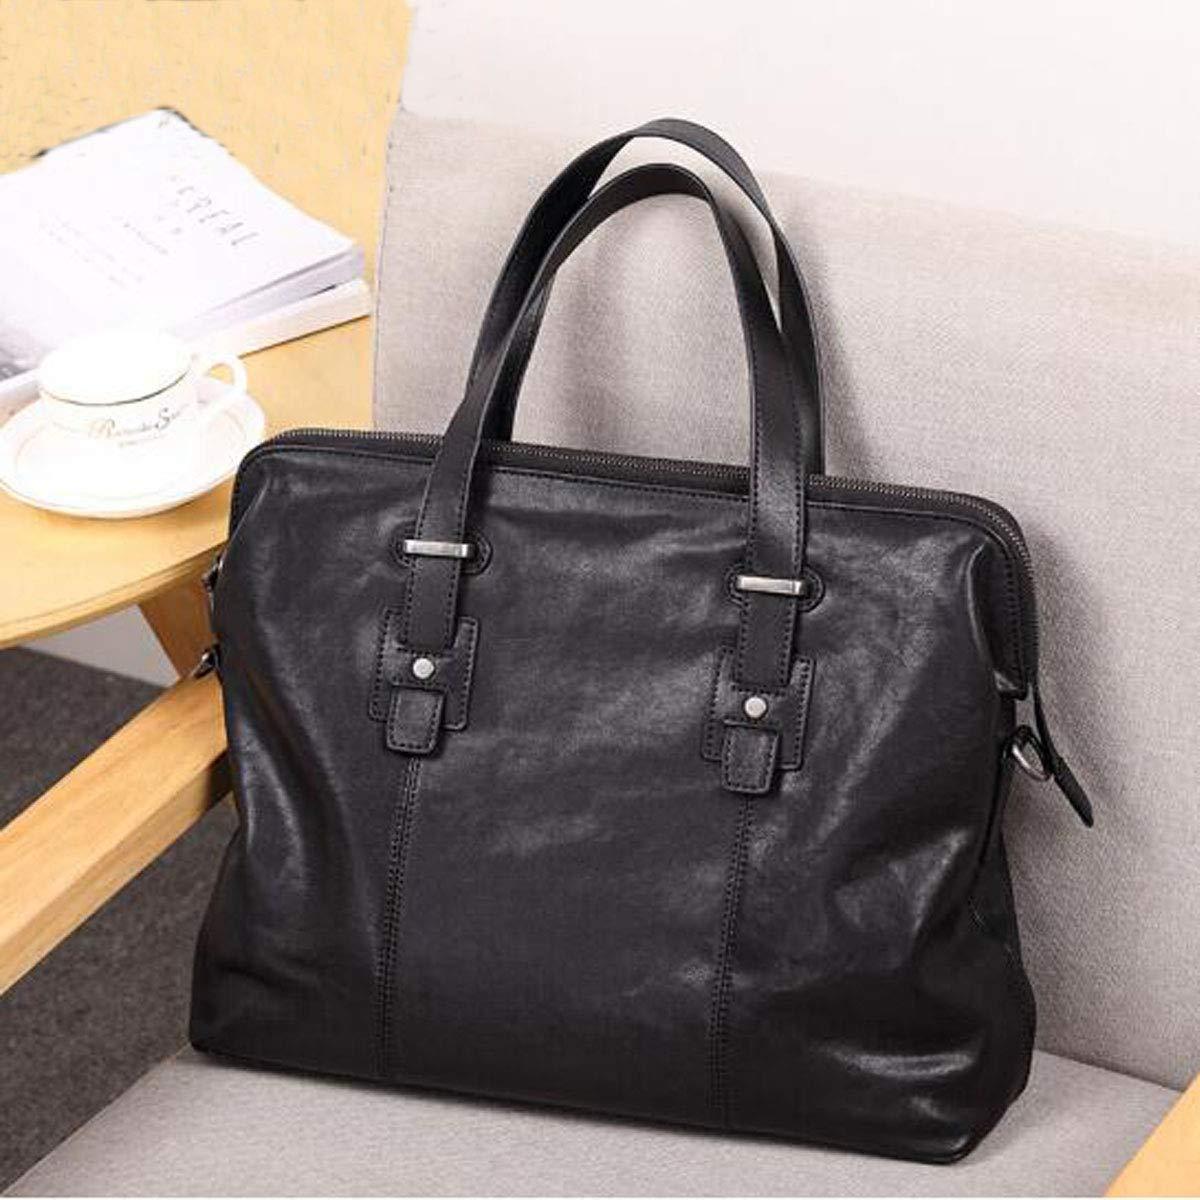 Large-Capacity First Layer Leather Mens Bag One-Shoulder Diagonal Bag 8haowenju Mens Leather Tote Color : Black Black 381231cm